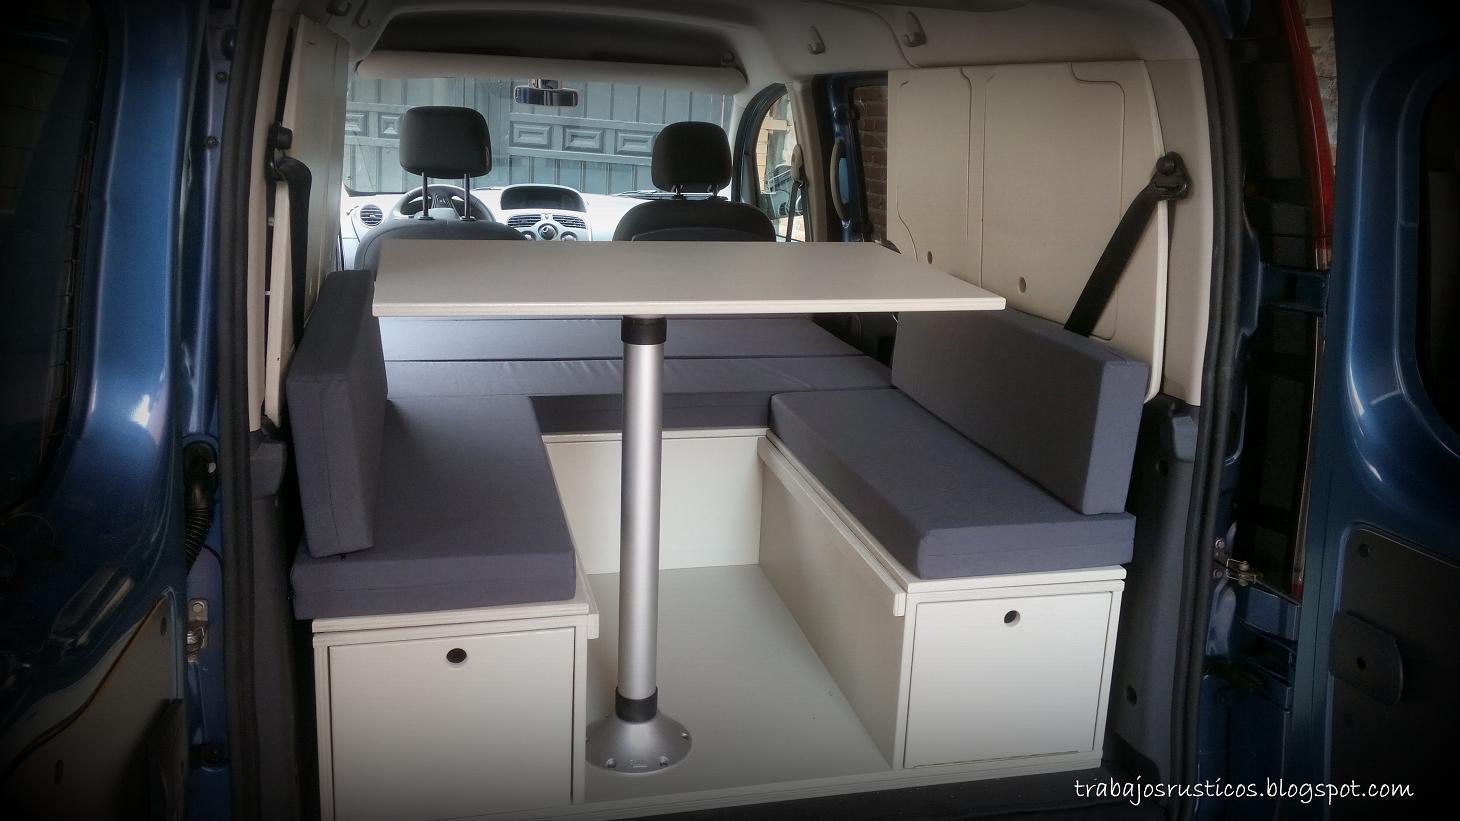 Accesorios interior coche toyota prius 7 plazas ms - Accesorios coche interior ...